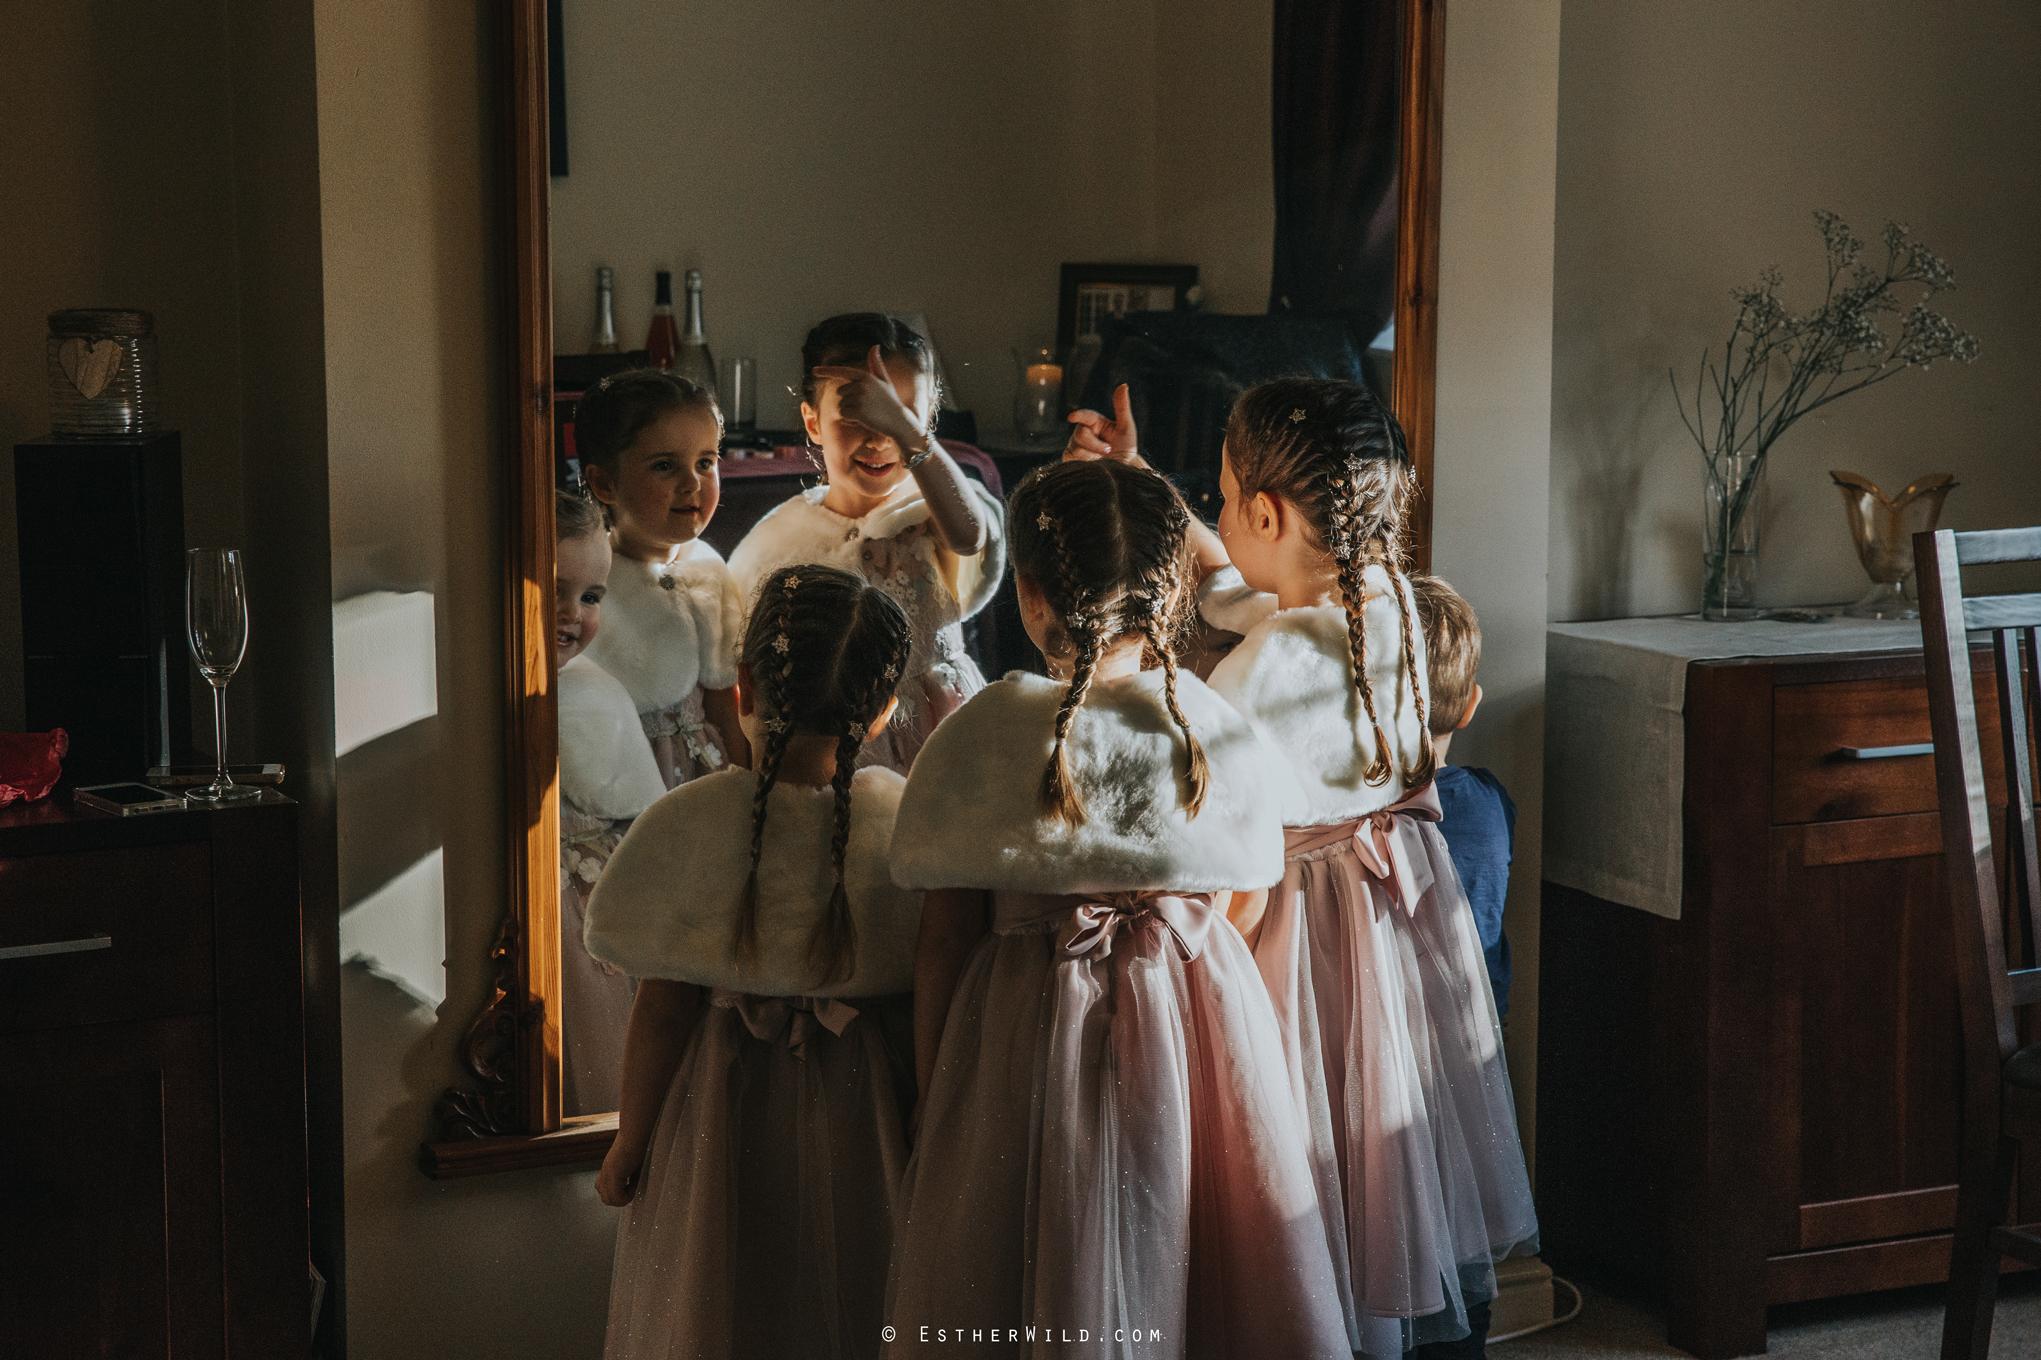 Wedding_Kings_Lynn_Town_Hall_Norfolk_Photographer_Esther_Wild_IMG_0480.jpg